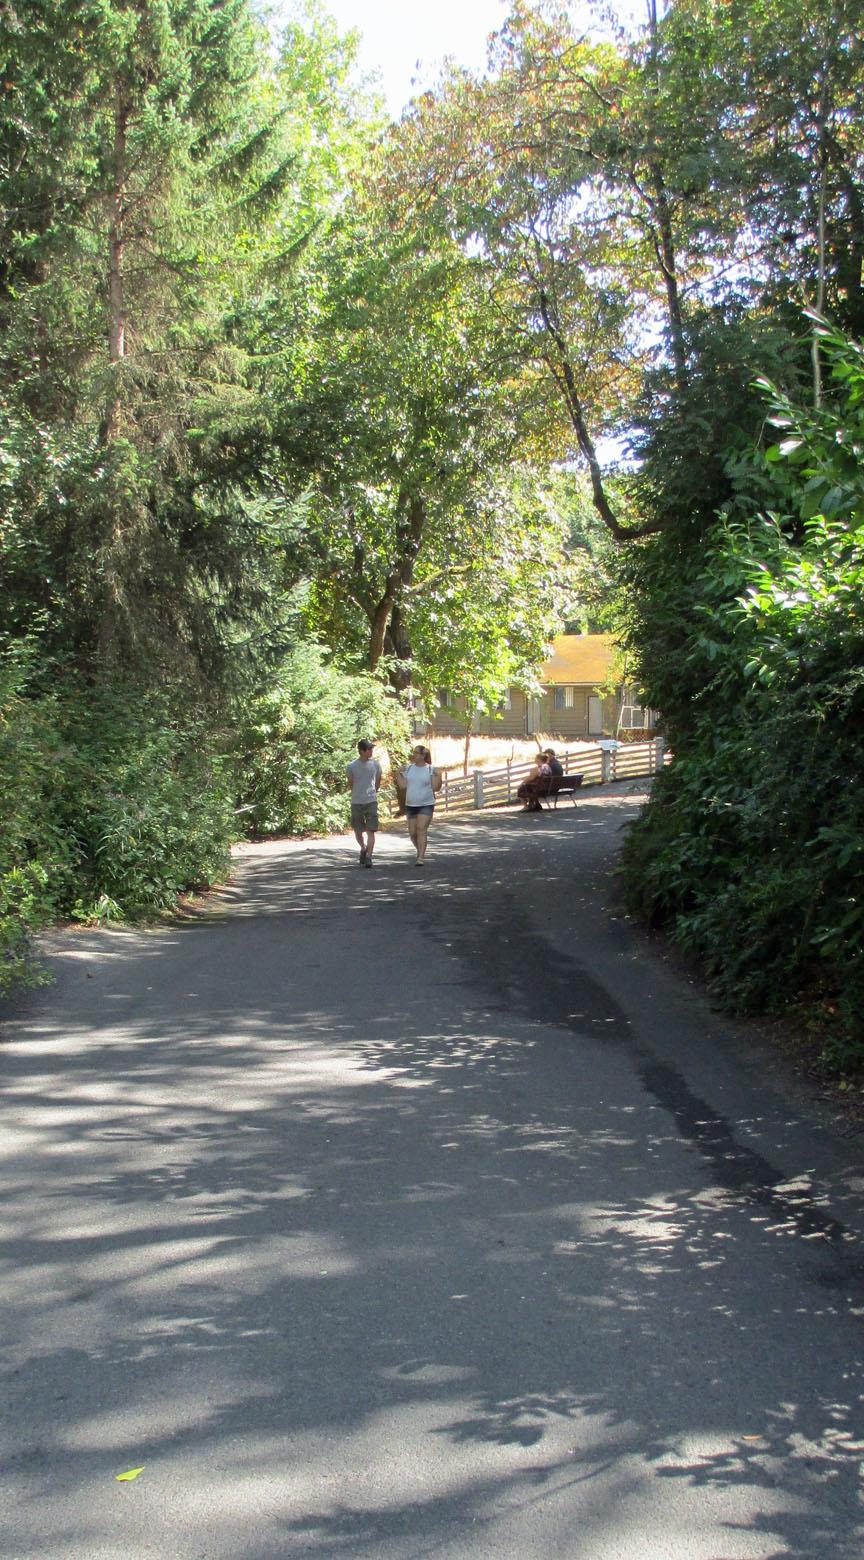 Woodland Park Zoo, Seattle, Gorillas, Lions, Meerkats, Falcons, best zoos in US.